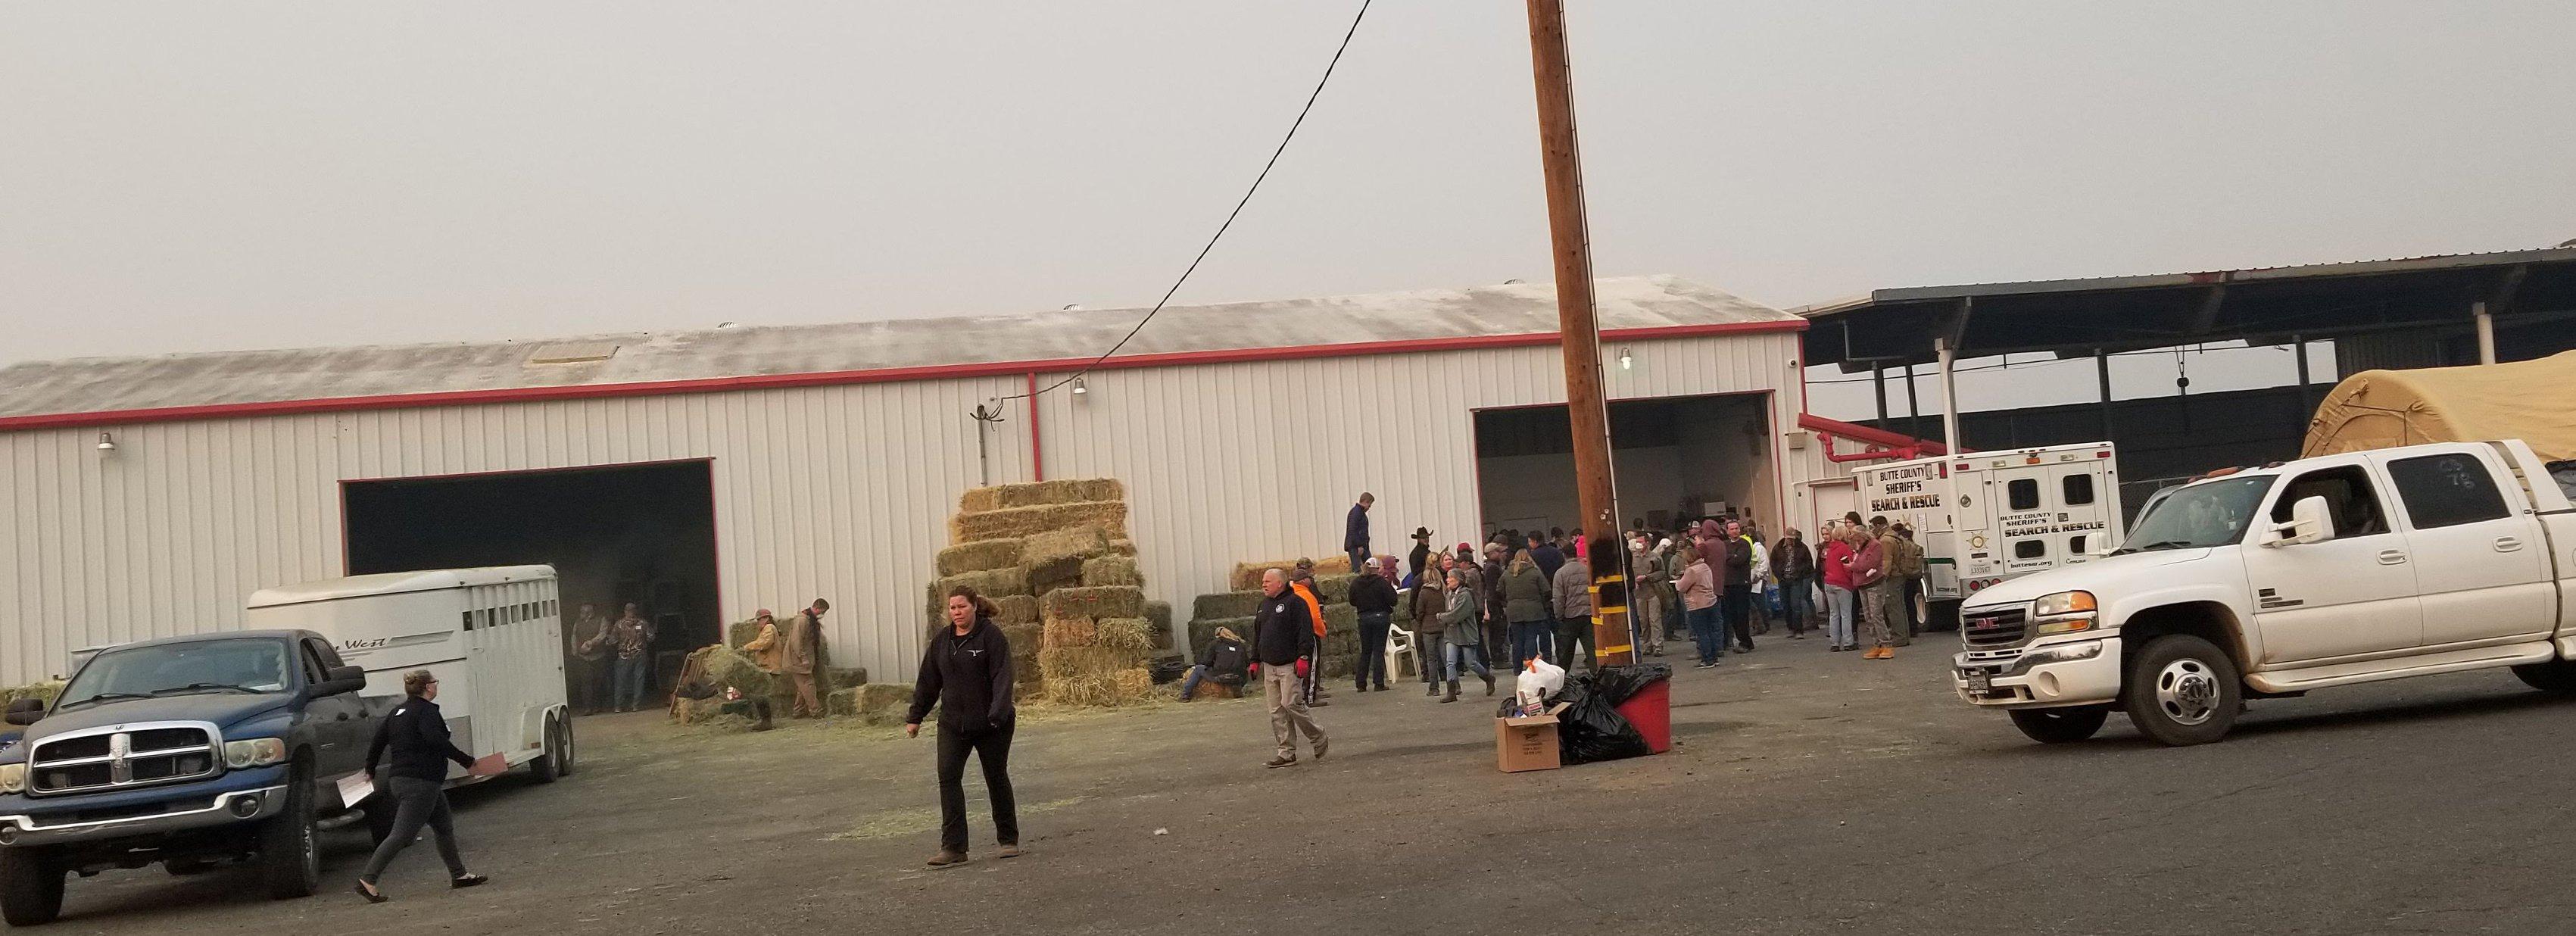 NVADG warehouse headquarters